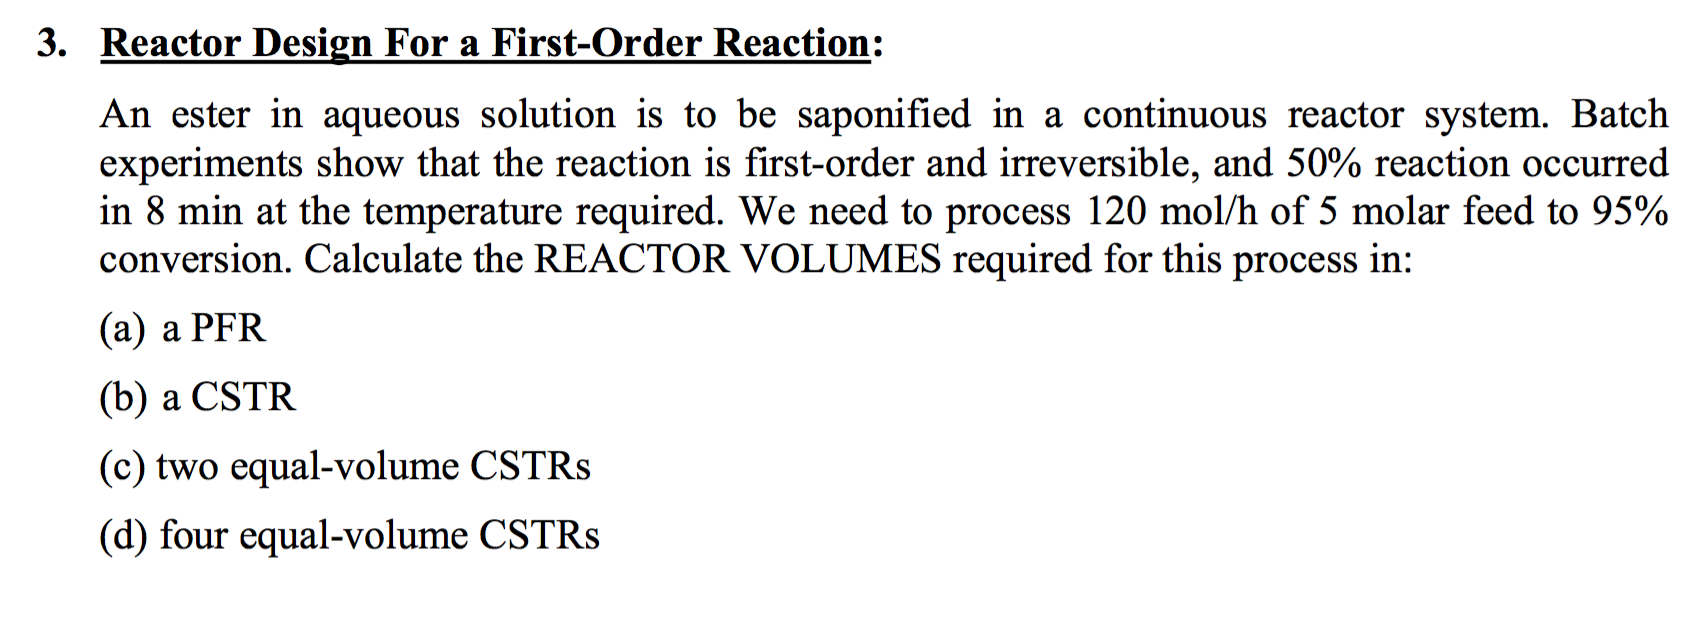 Reactor Design For A Storder Reaction PFRplug Cheggcom - Cstr reactor design